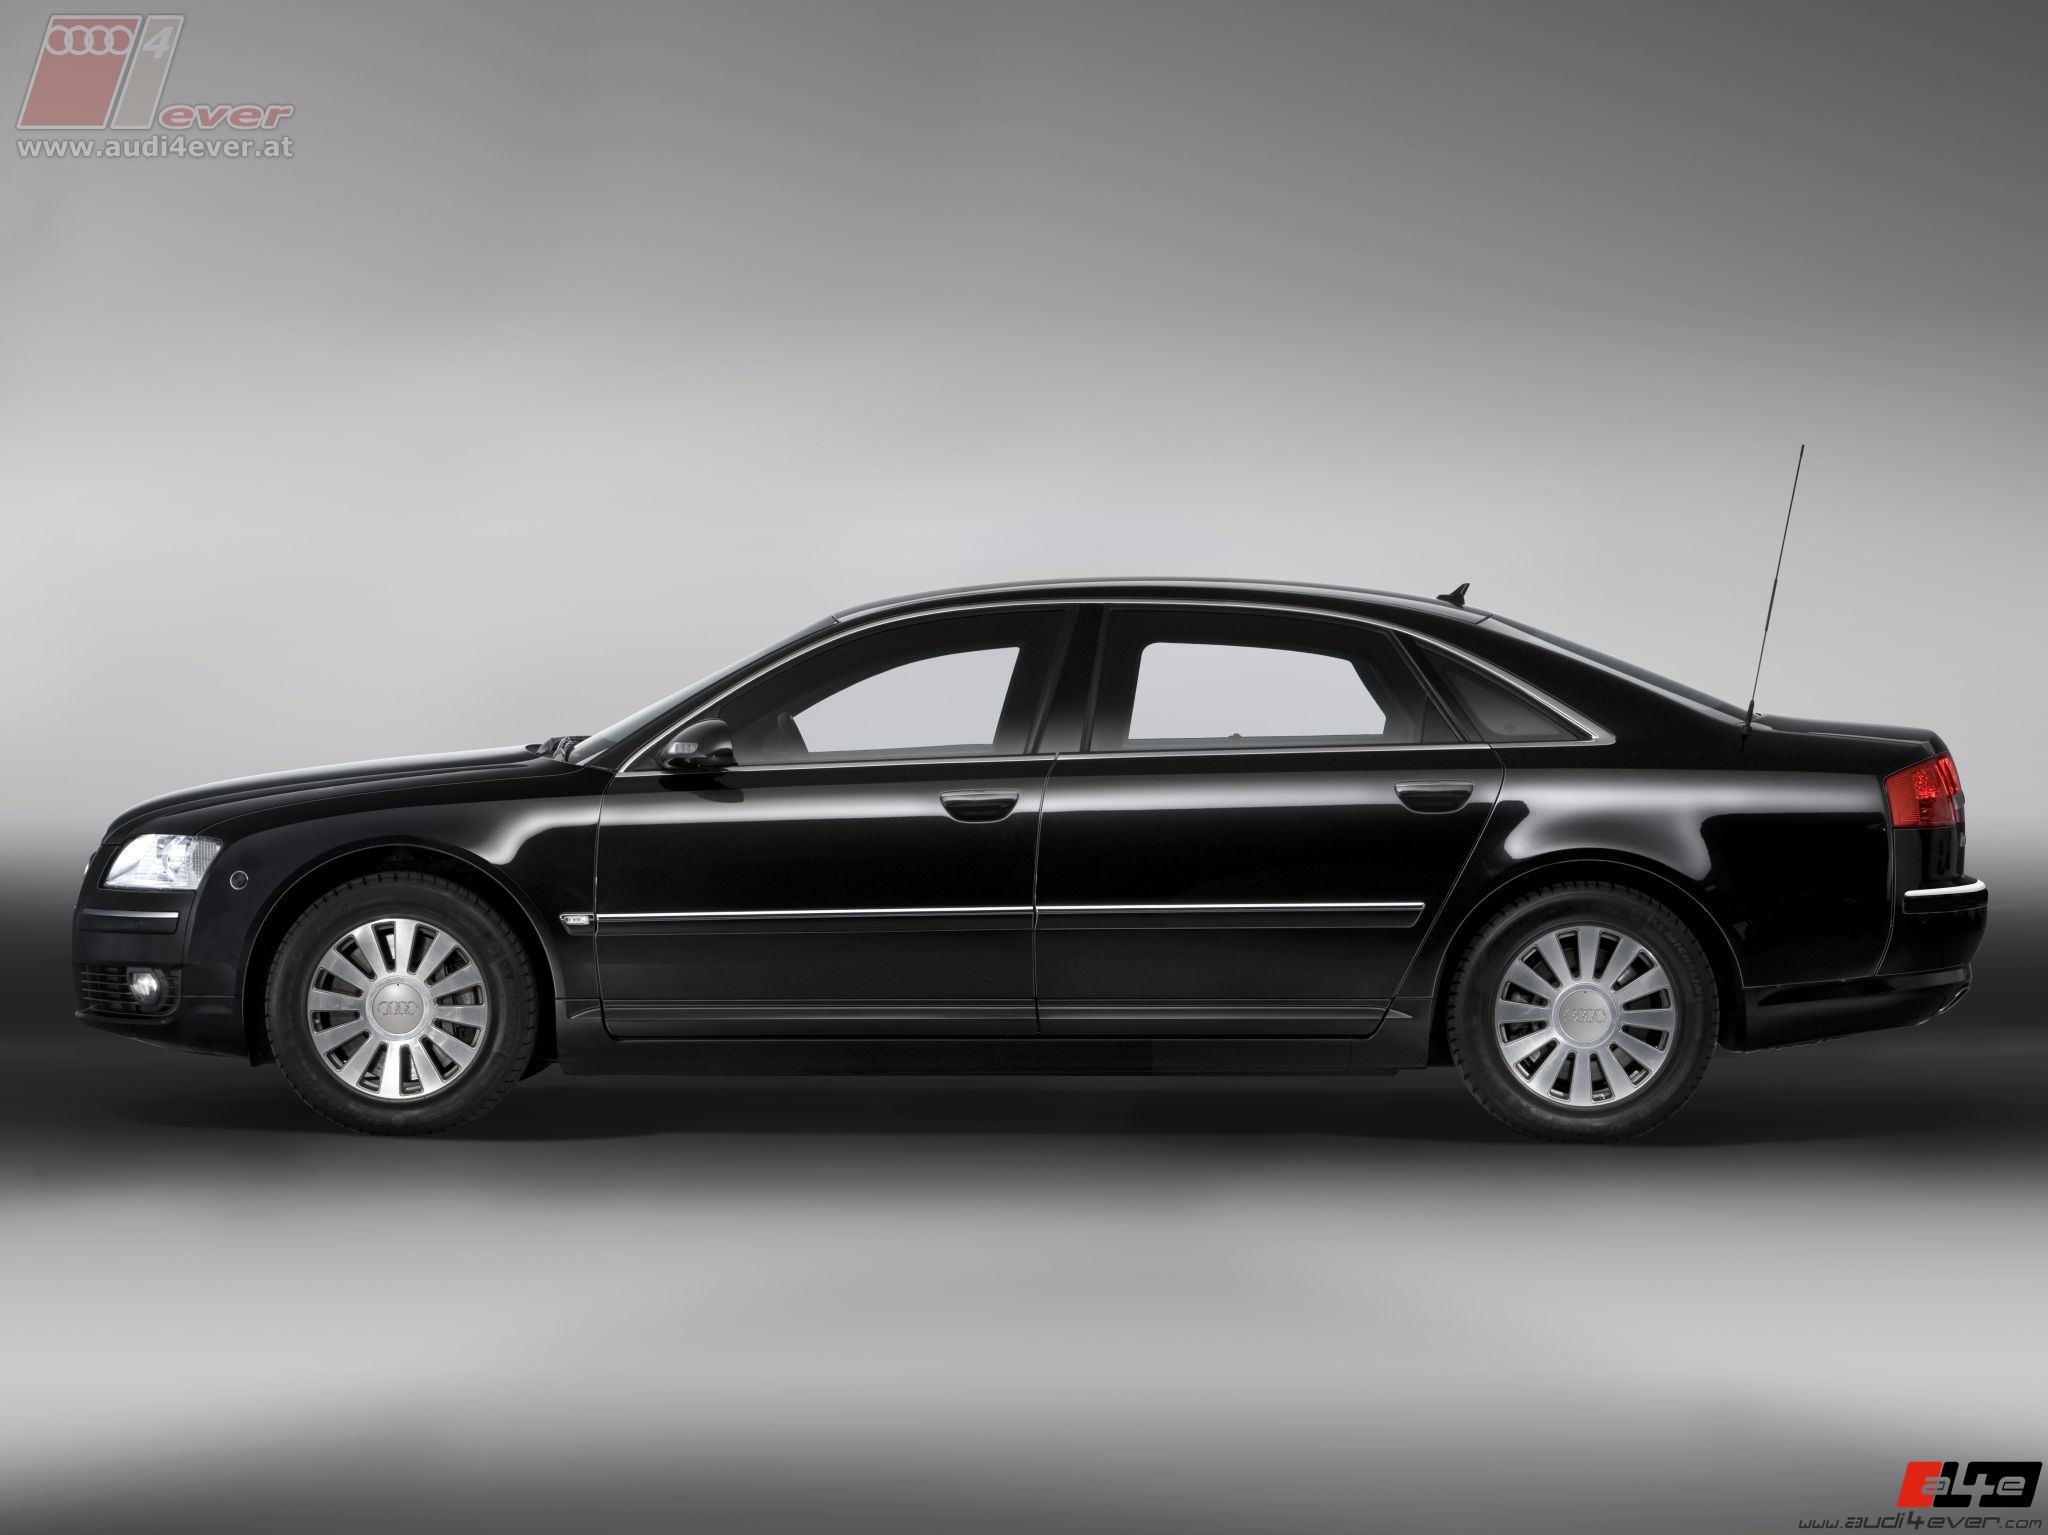 A4e Gallery Audi A8 D3 Audi A8l D3 Sfg 6 0 W12